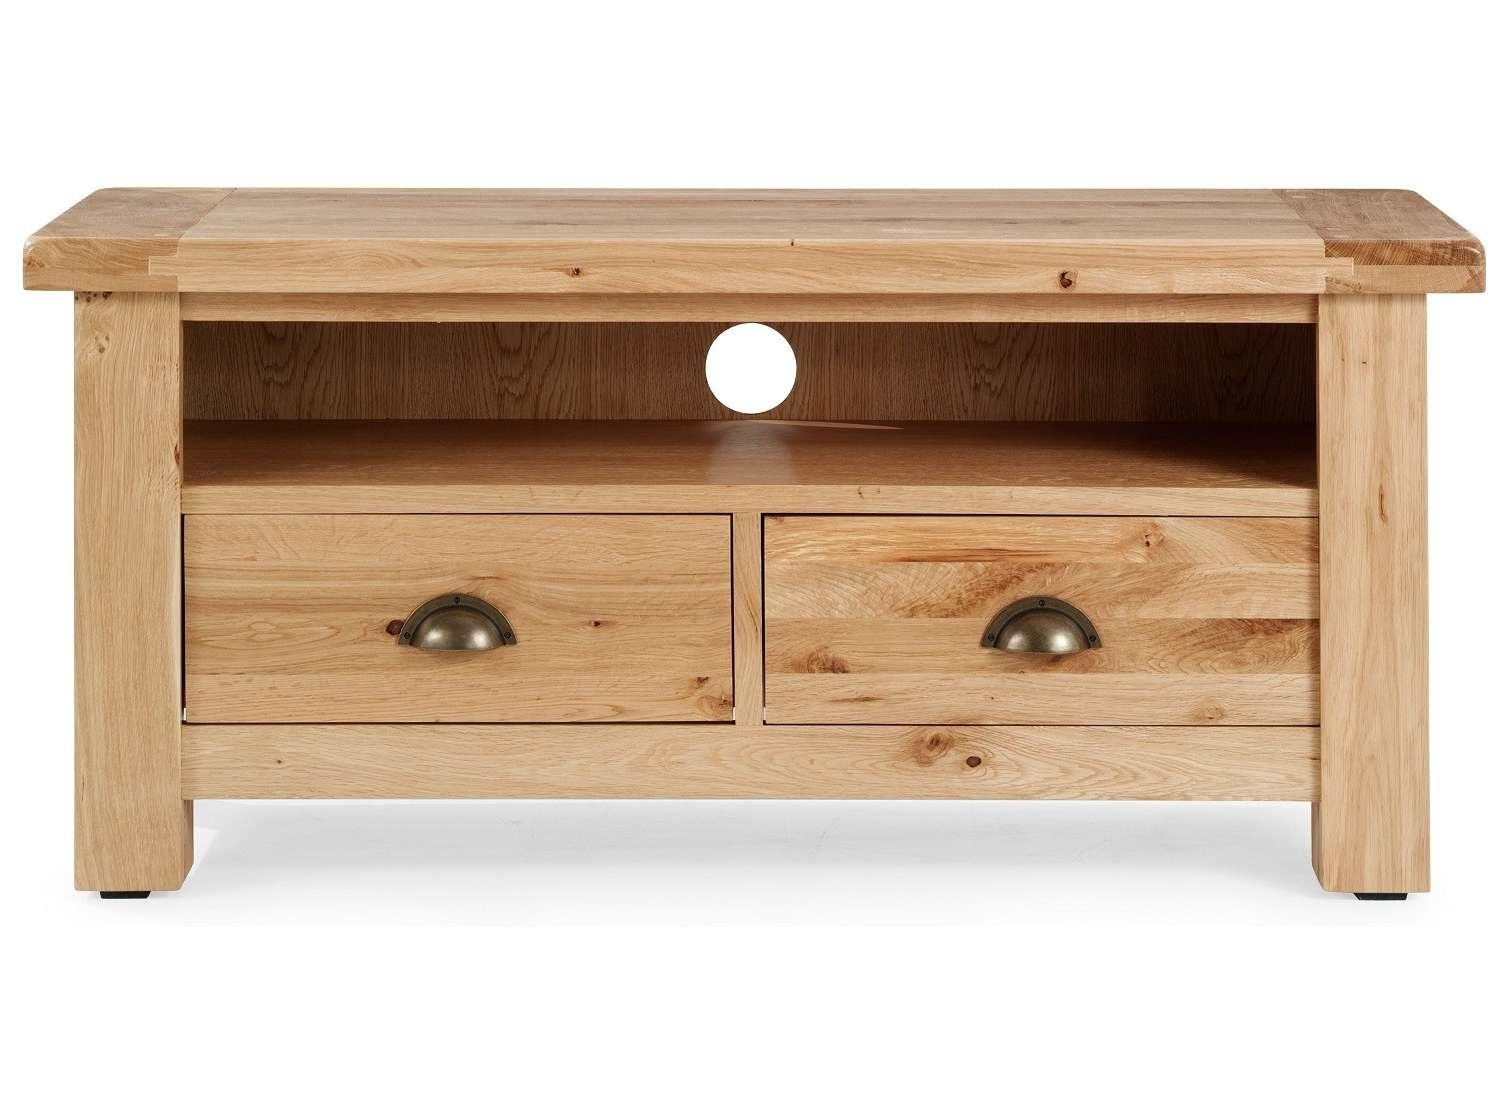 Normandy Rustic French Oak Tv Cabinet   Oak Furniture Uk With Light Oak Corner Tv Cabinets (View 13 of 20)